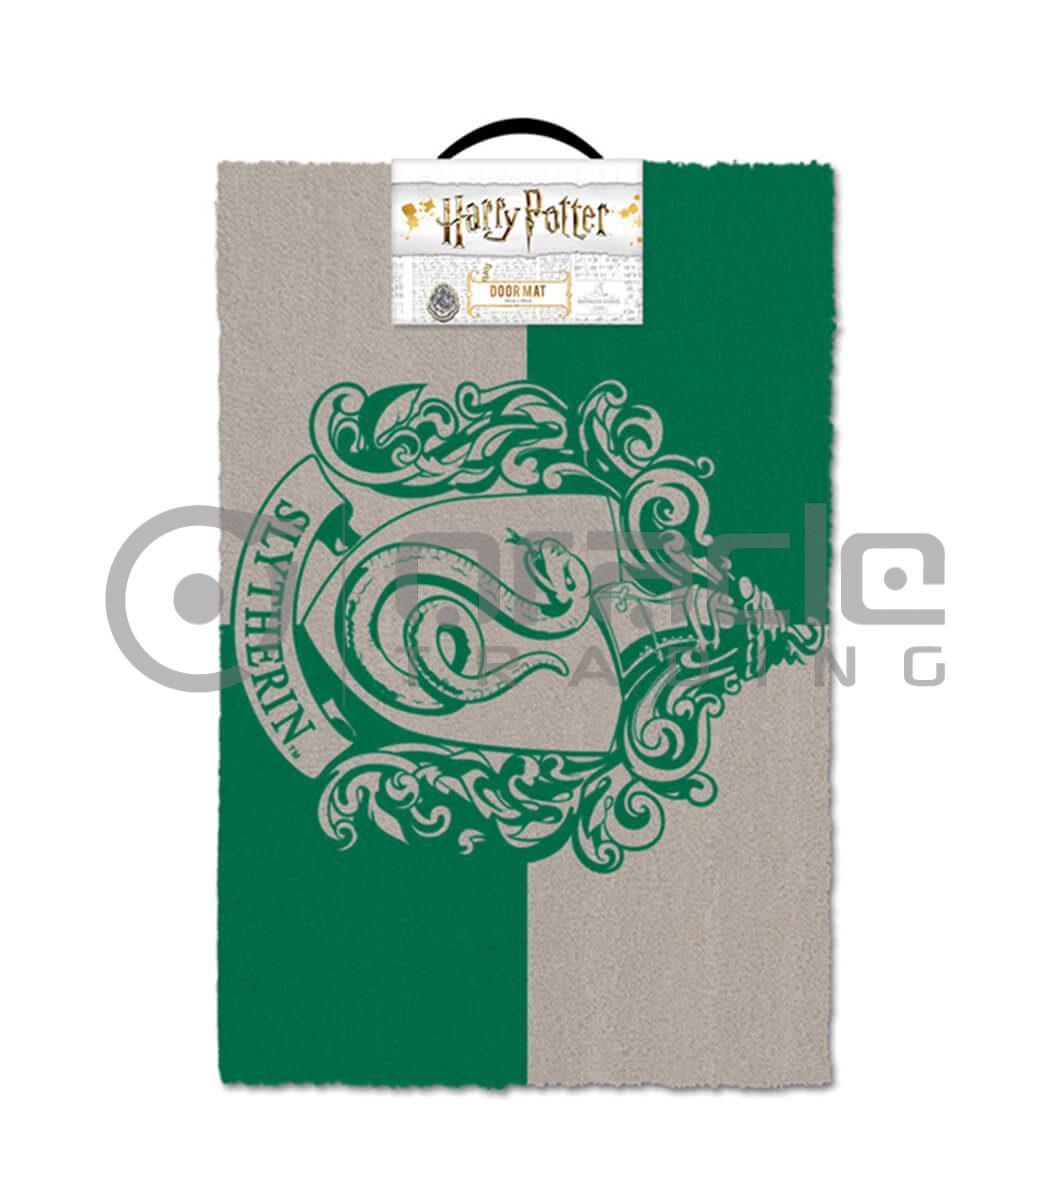 Harry Potter Doormat - Slytherin